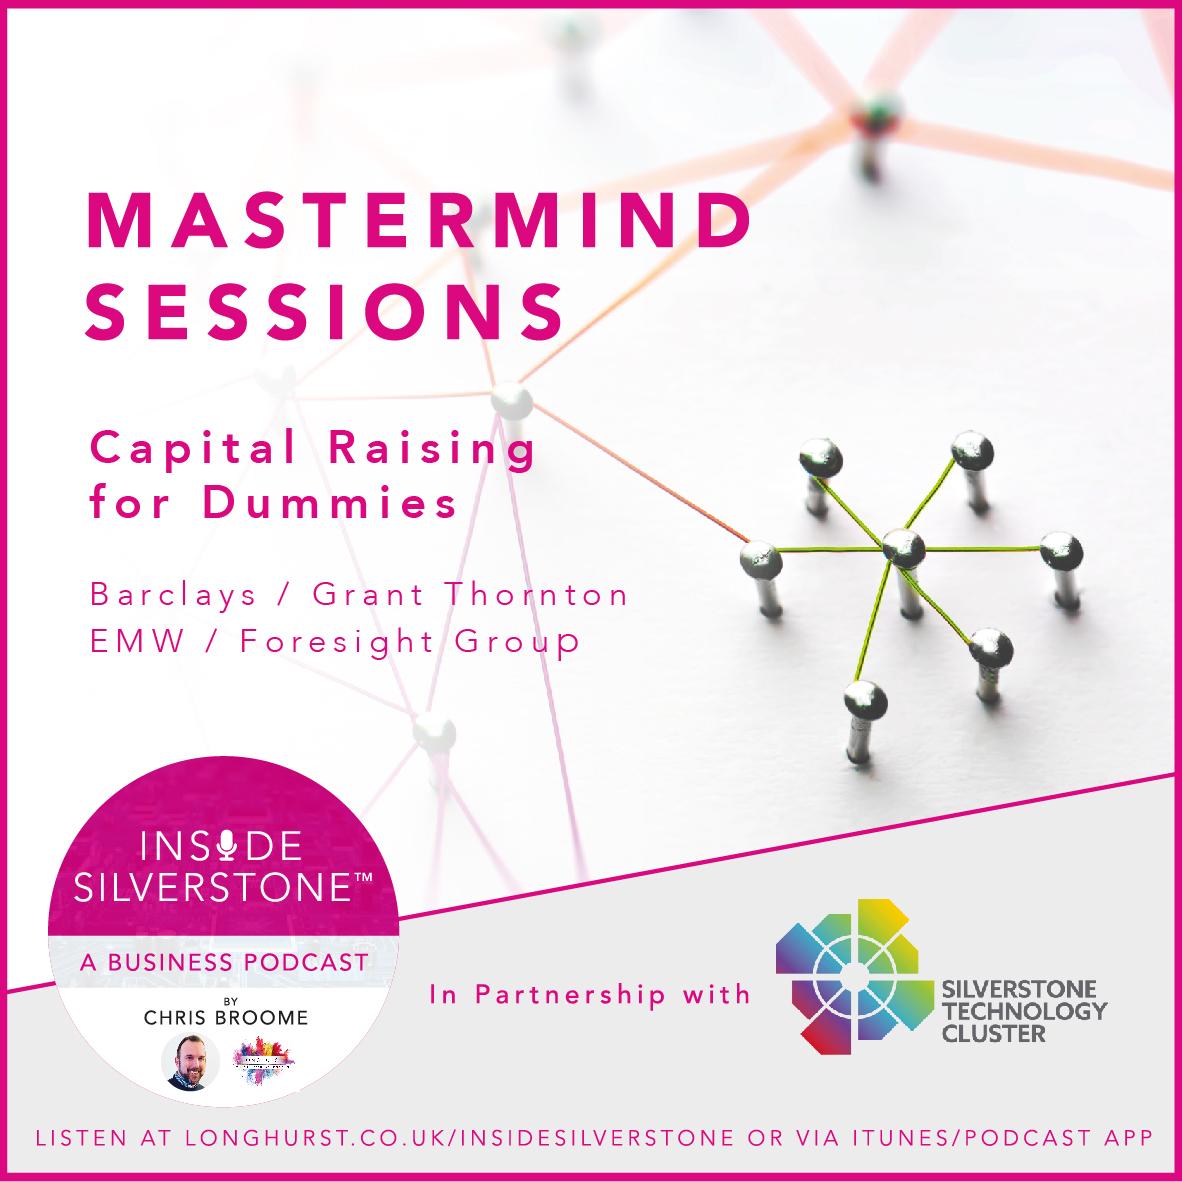 Mastermind Session #1 : Capital Raising for Dummies